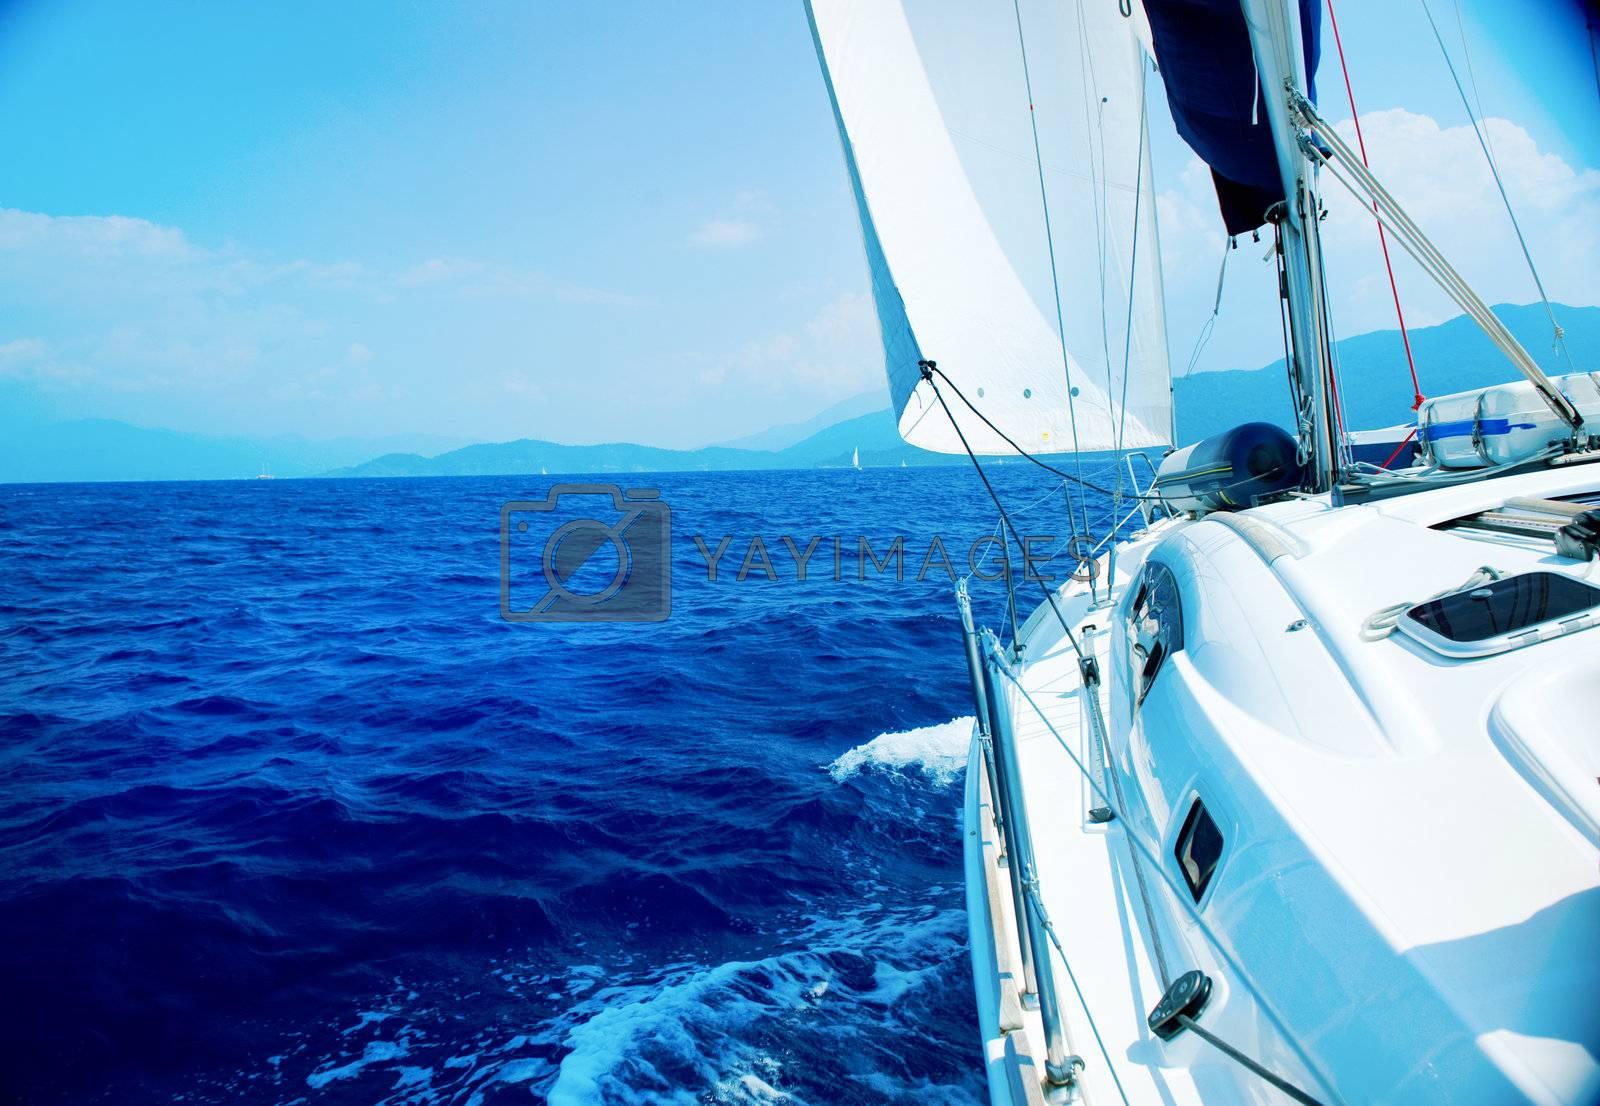 Travel .Luxury Yacht. Sailing by Subbotina Anna